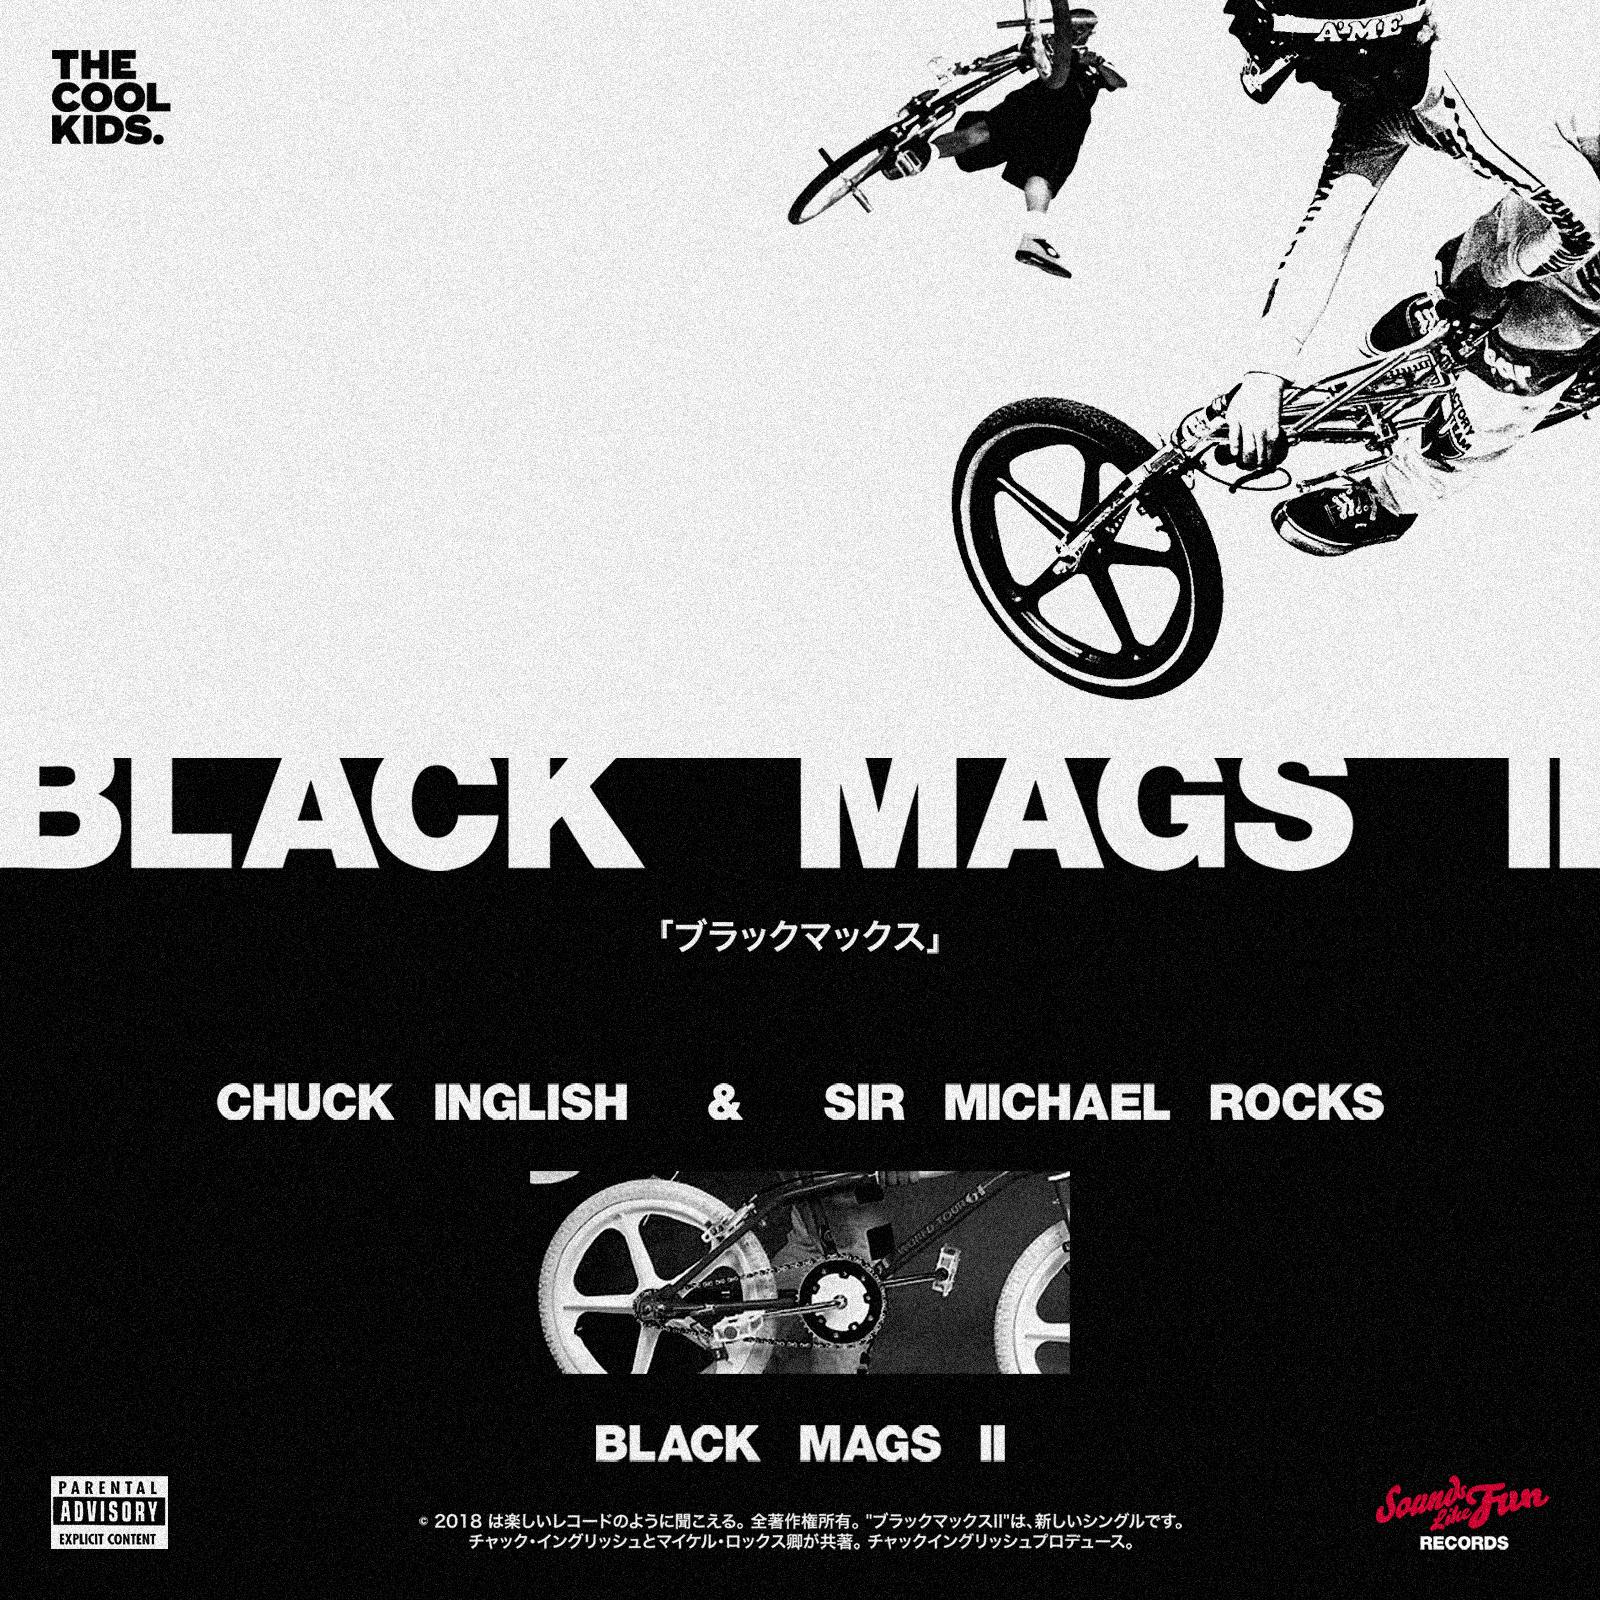 The Cool Kids   Black Mags pt II single